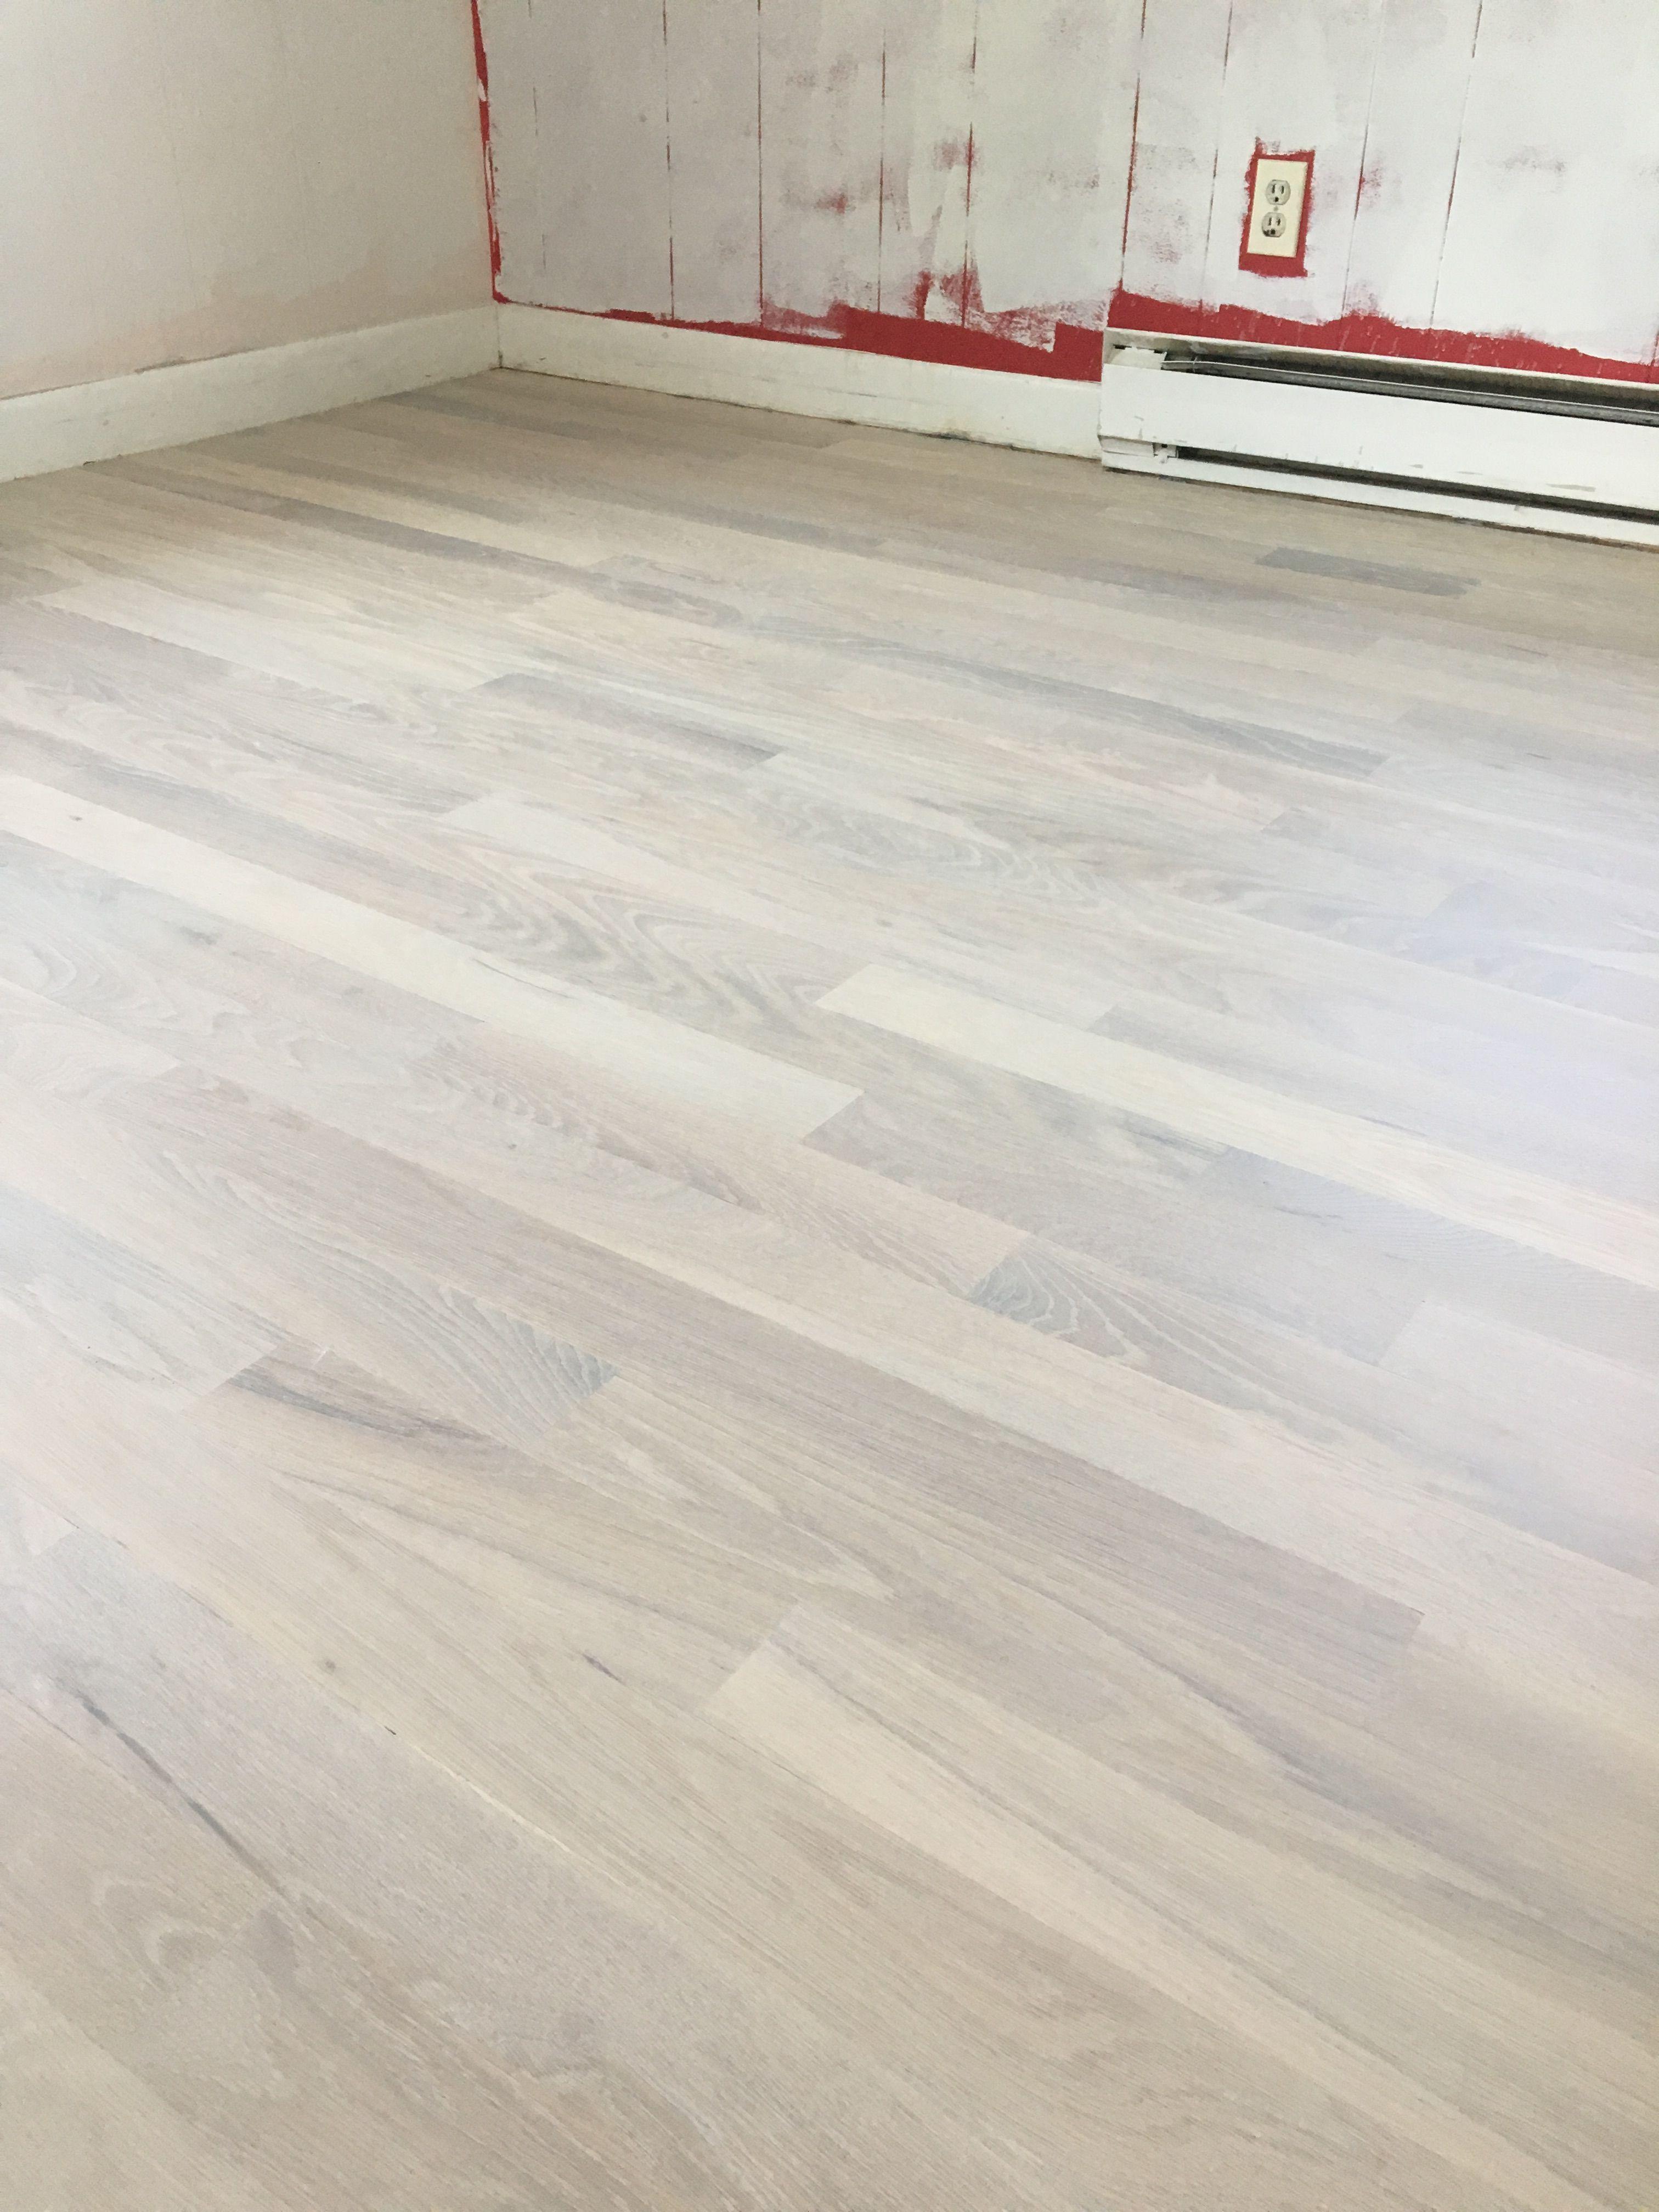 Loba S Pretone Color White Oak Hardwood Floors White Wood Stain White Wood Floors